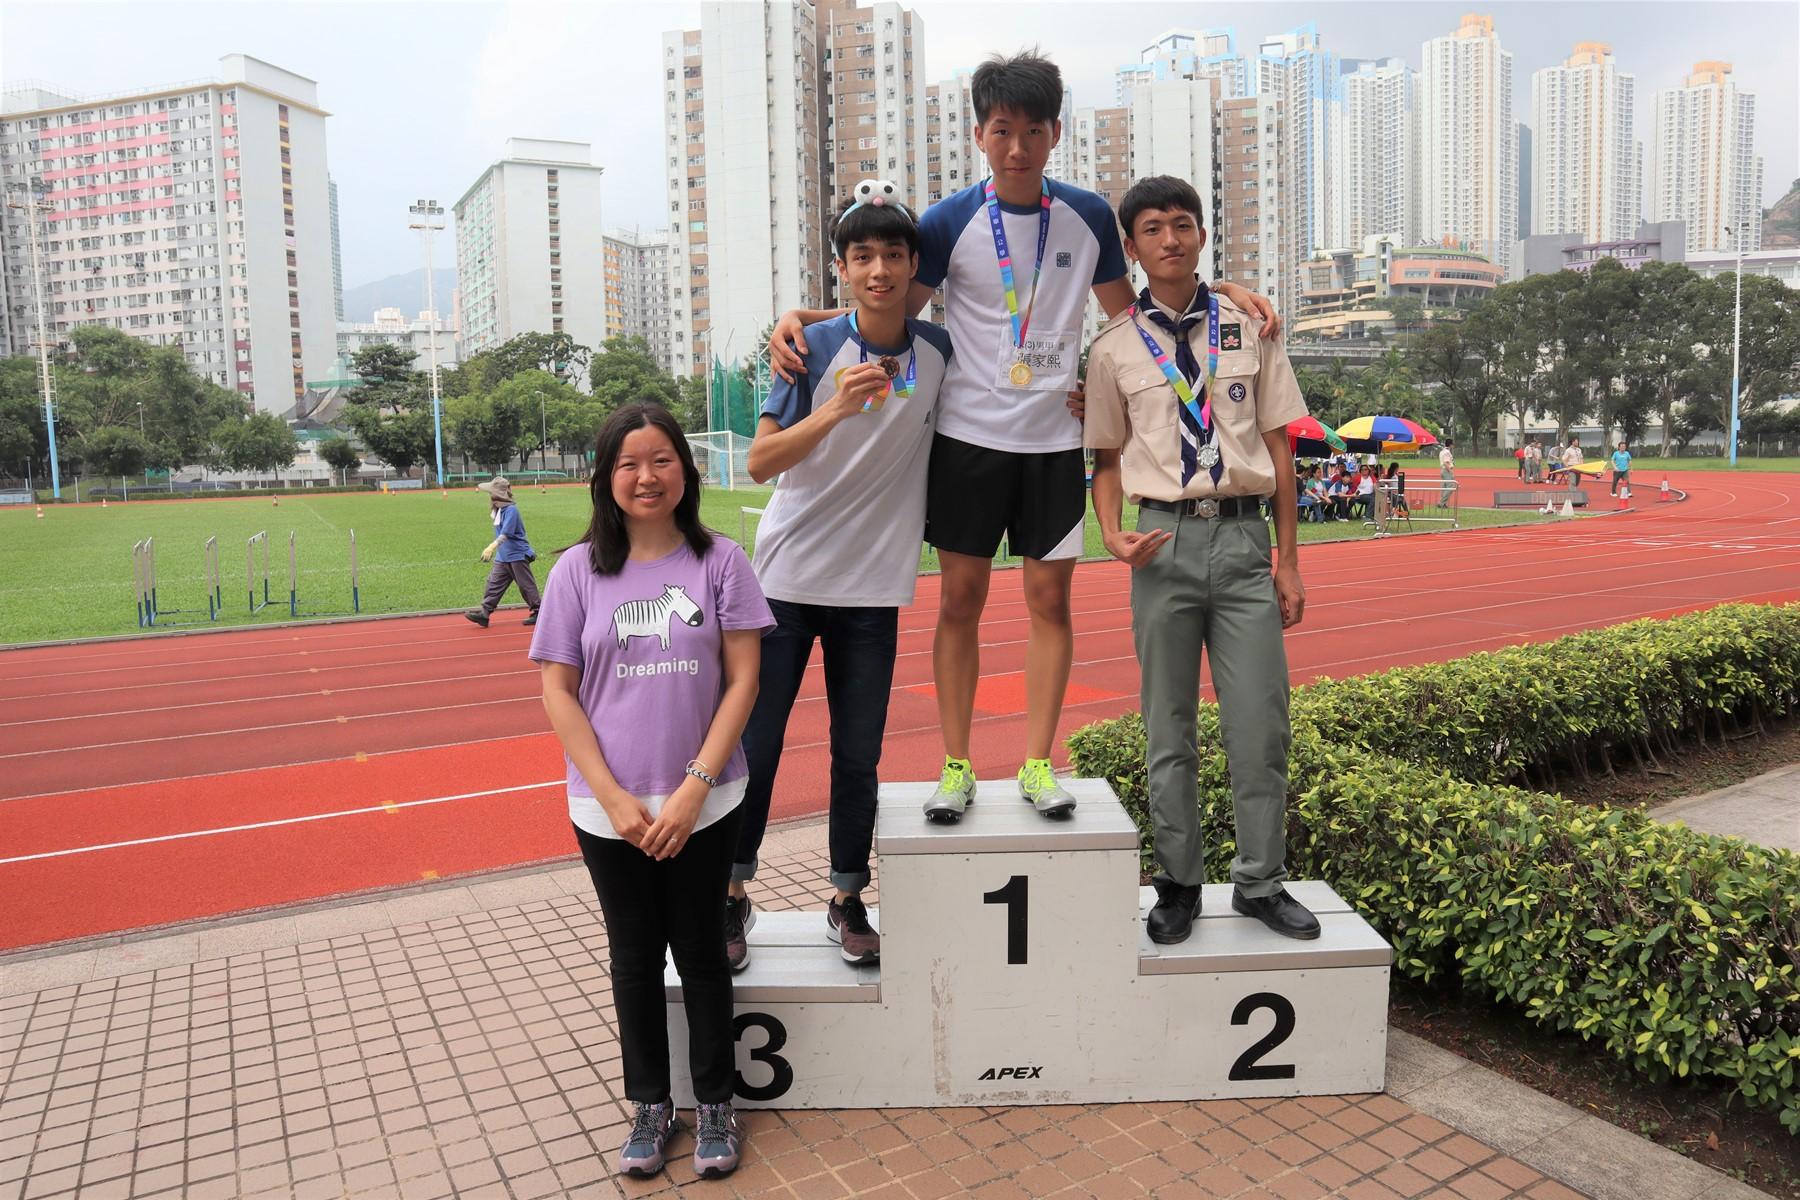 http://npc.edu.hk/sites/default/files/img_9334_1.jpg